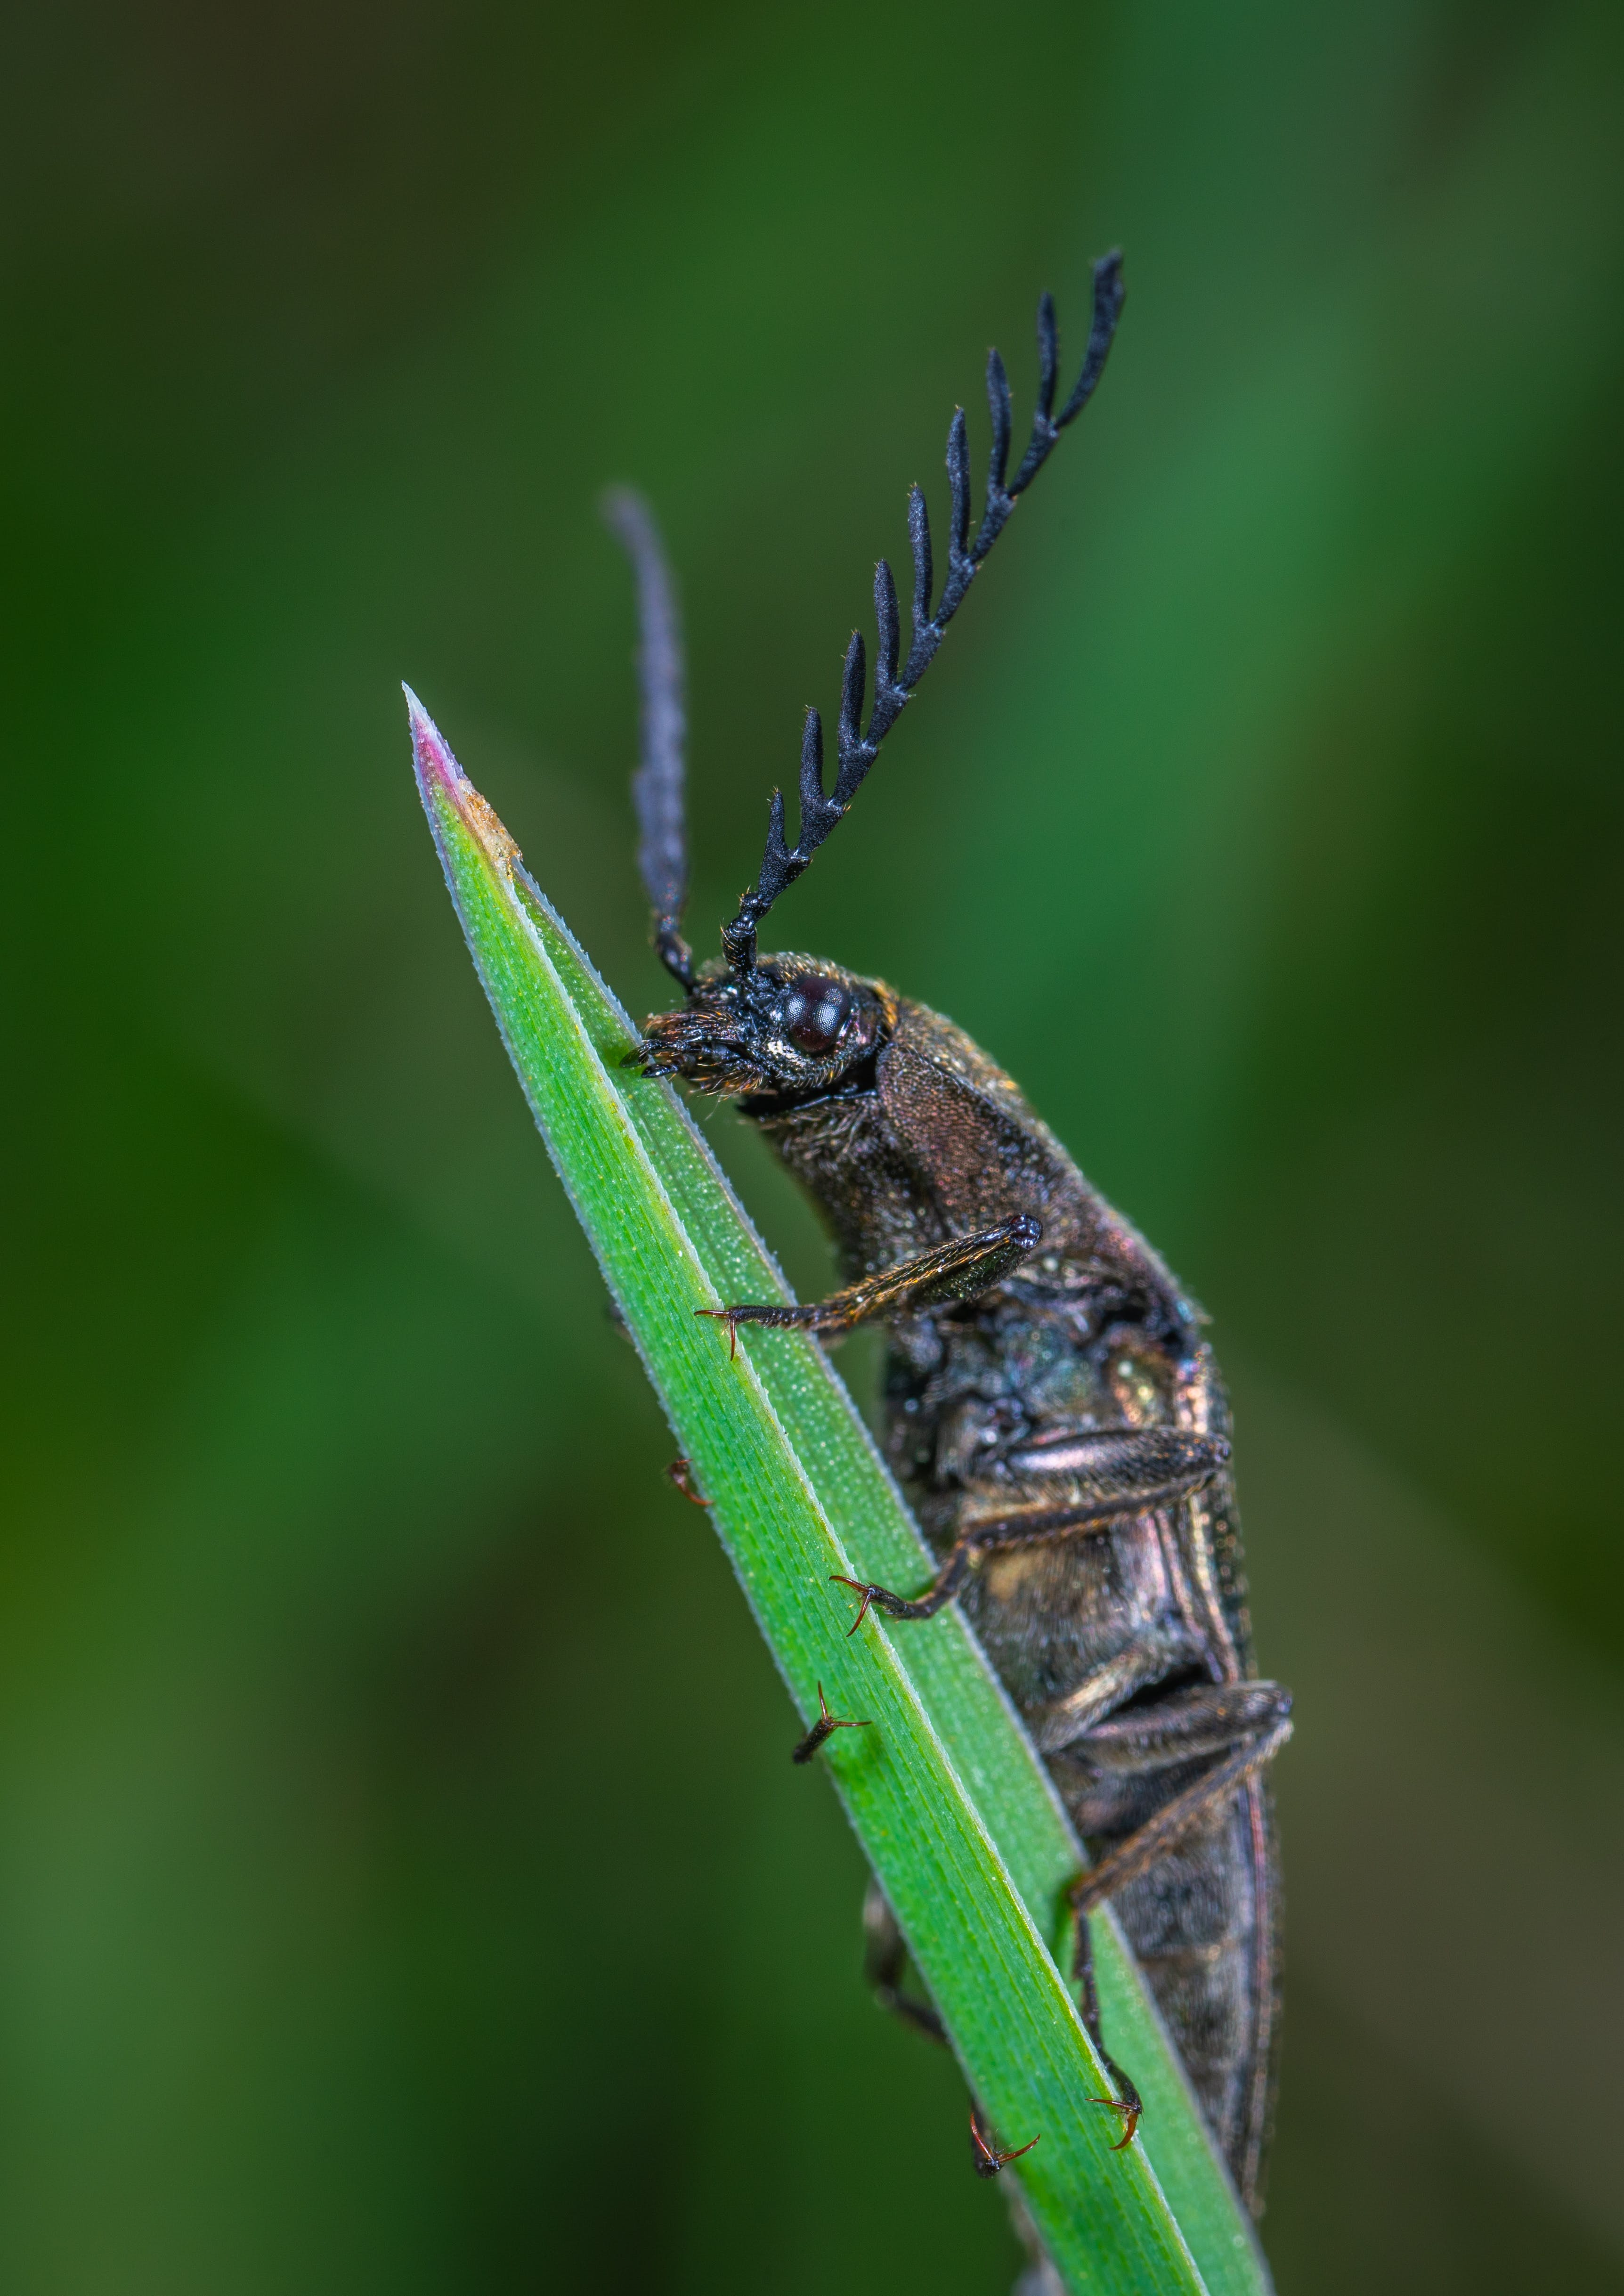 Selective Focus Photography of Black Leaf-horned Beetle Perched on Green Leaf